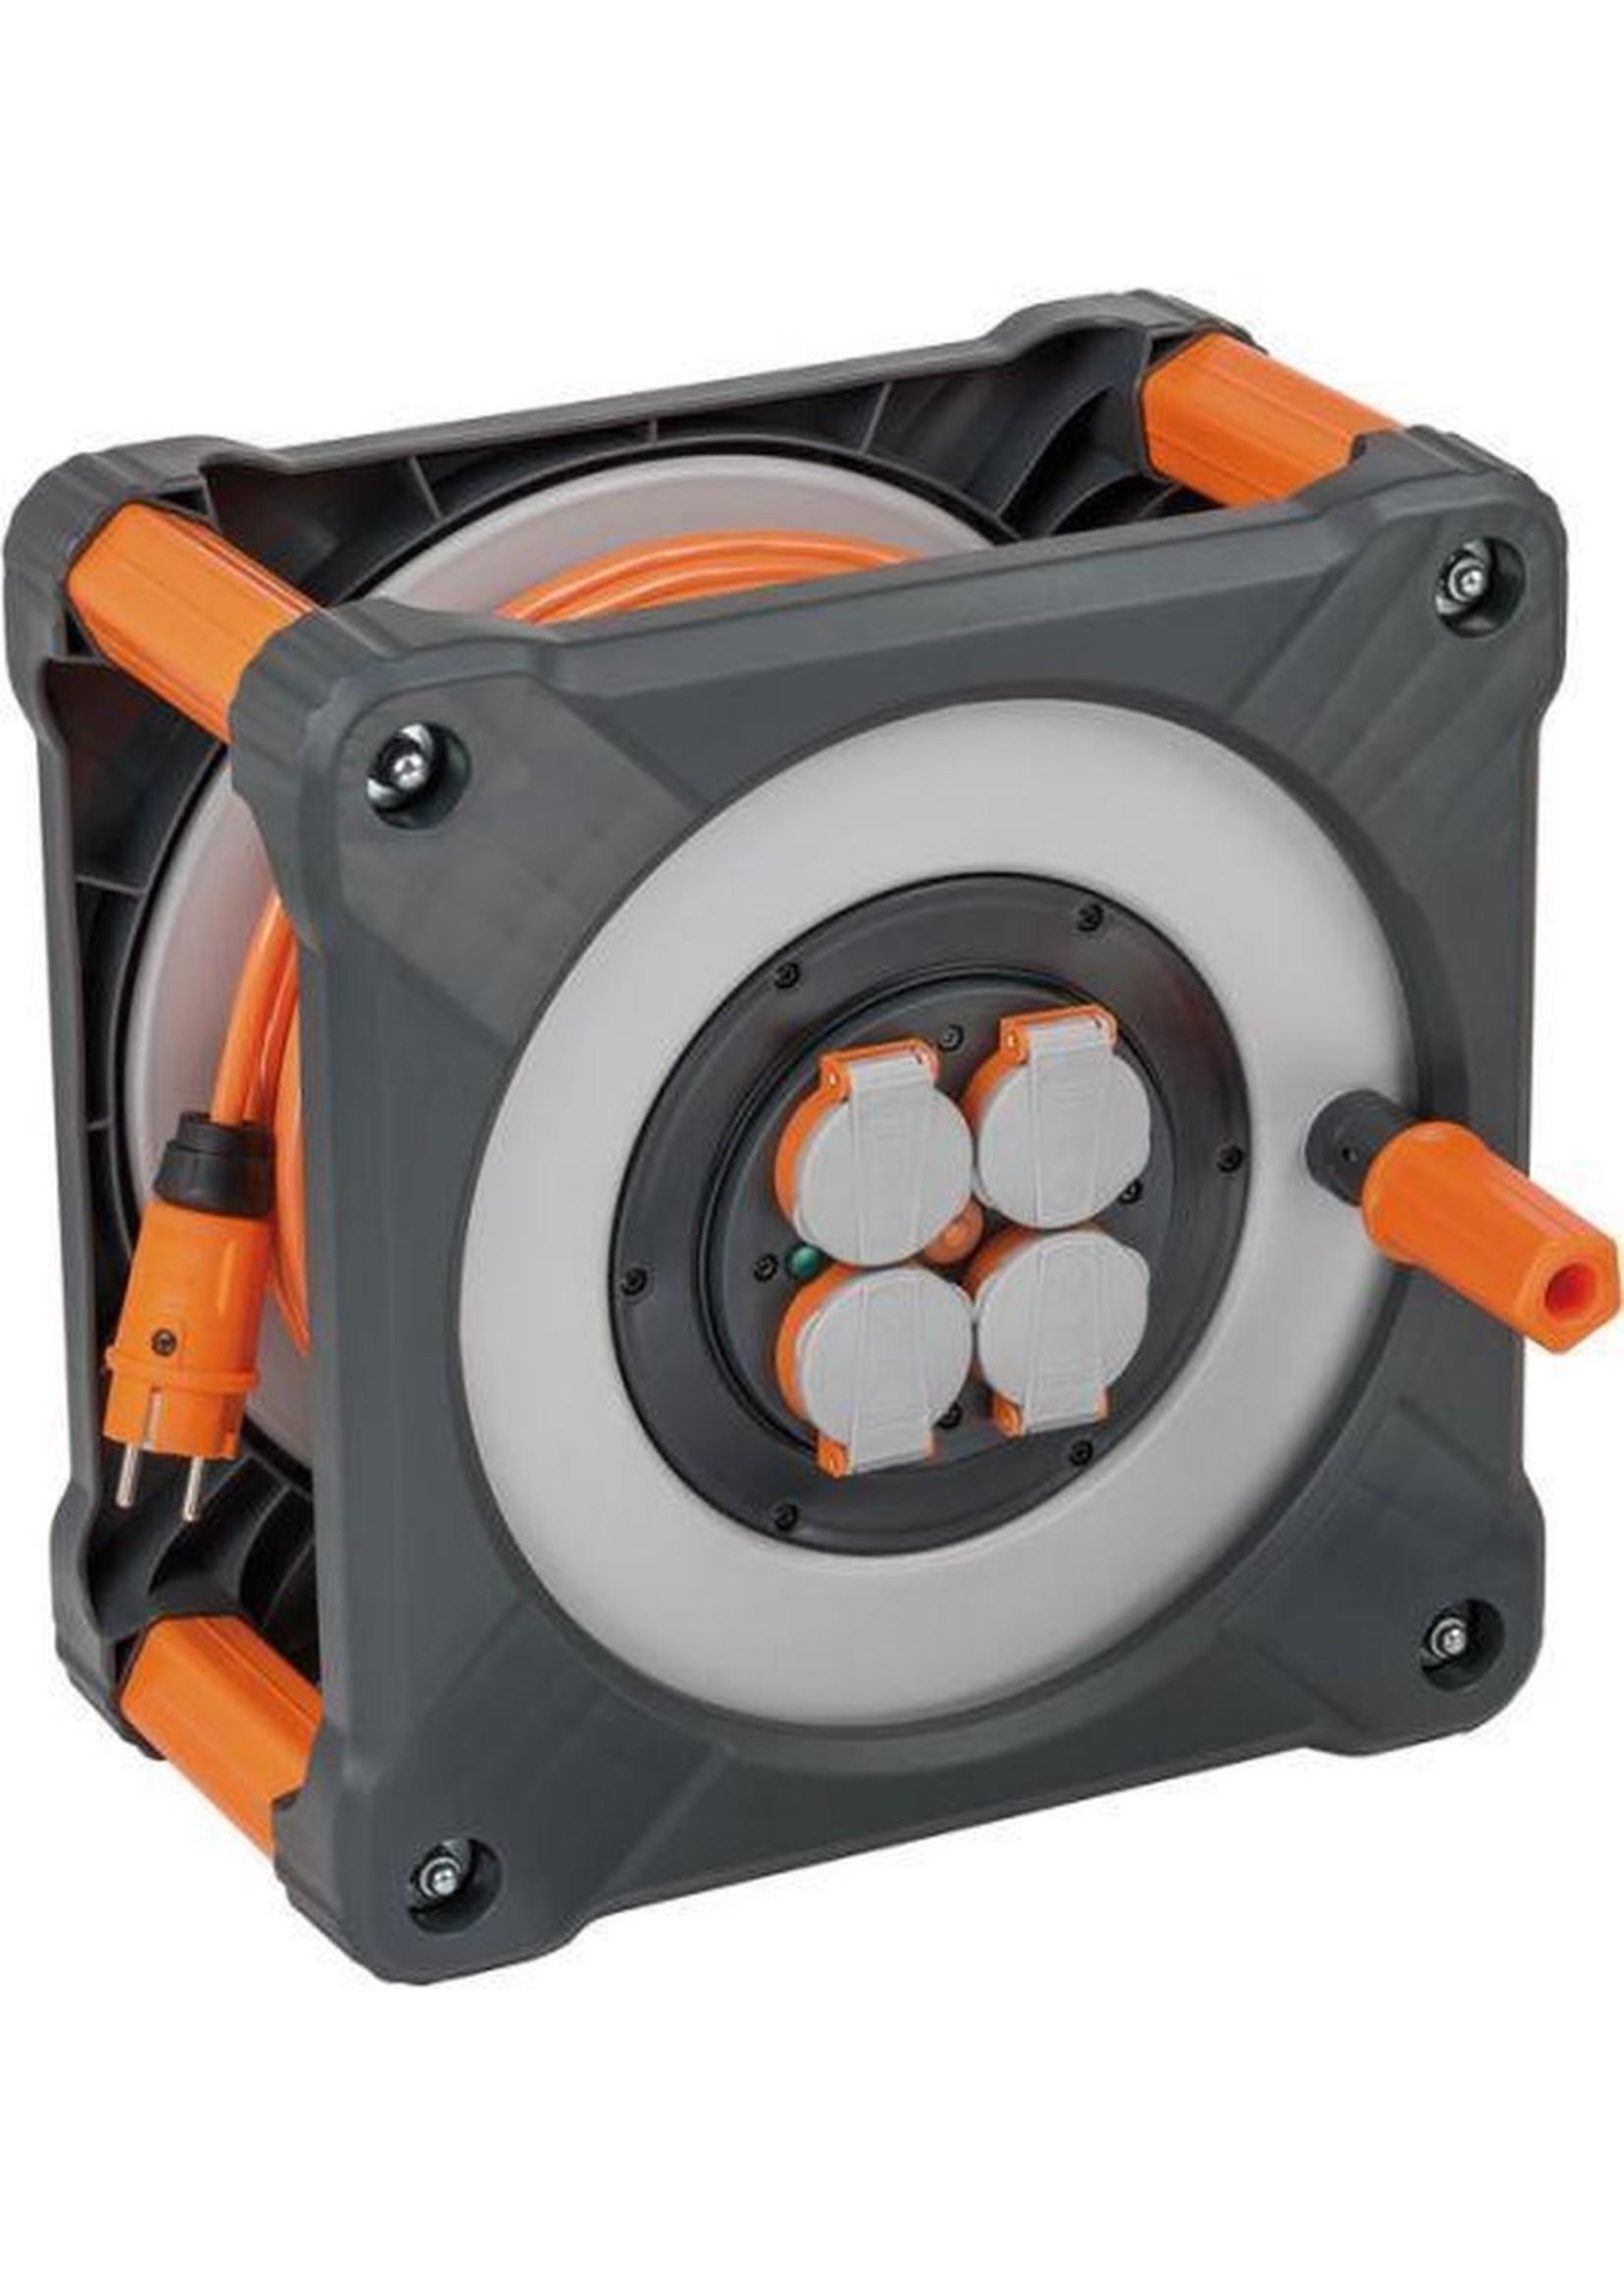 Brennenstuhl Brennenstuhl kabelhaspel Cube 33mtr 3x1.5mm - IP44